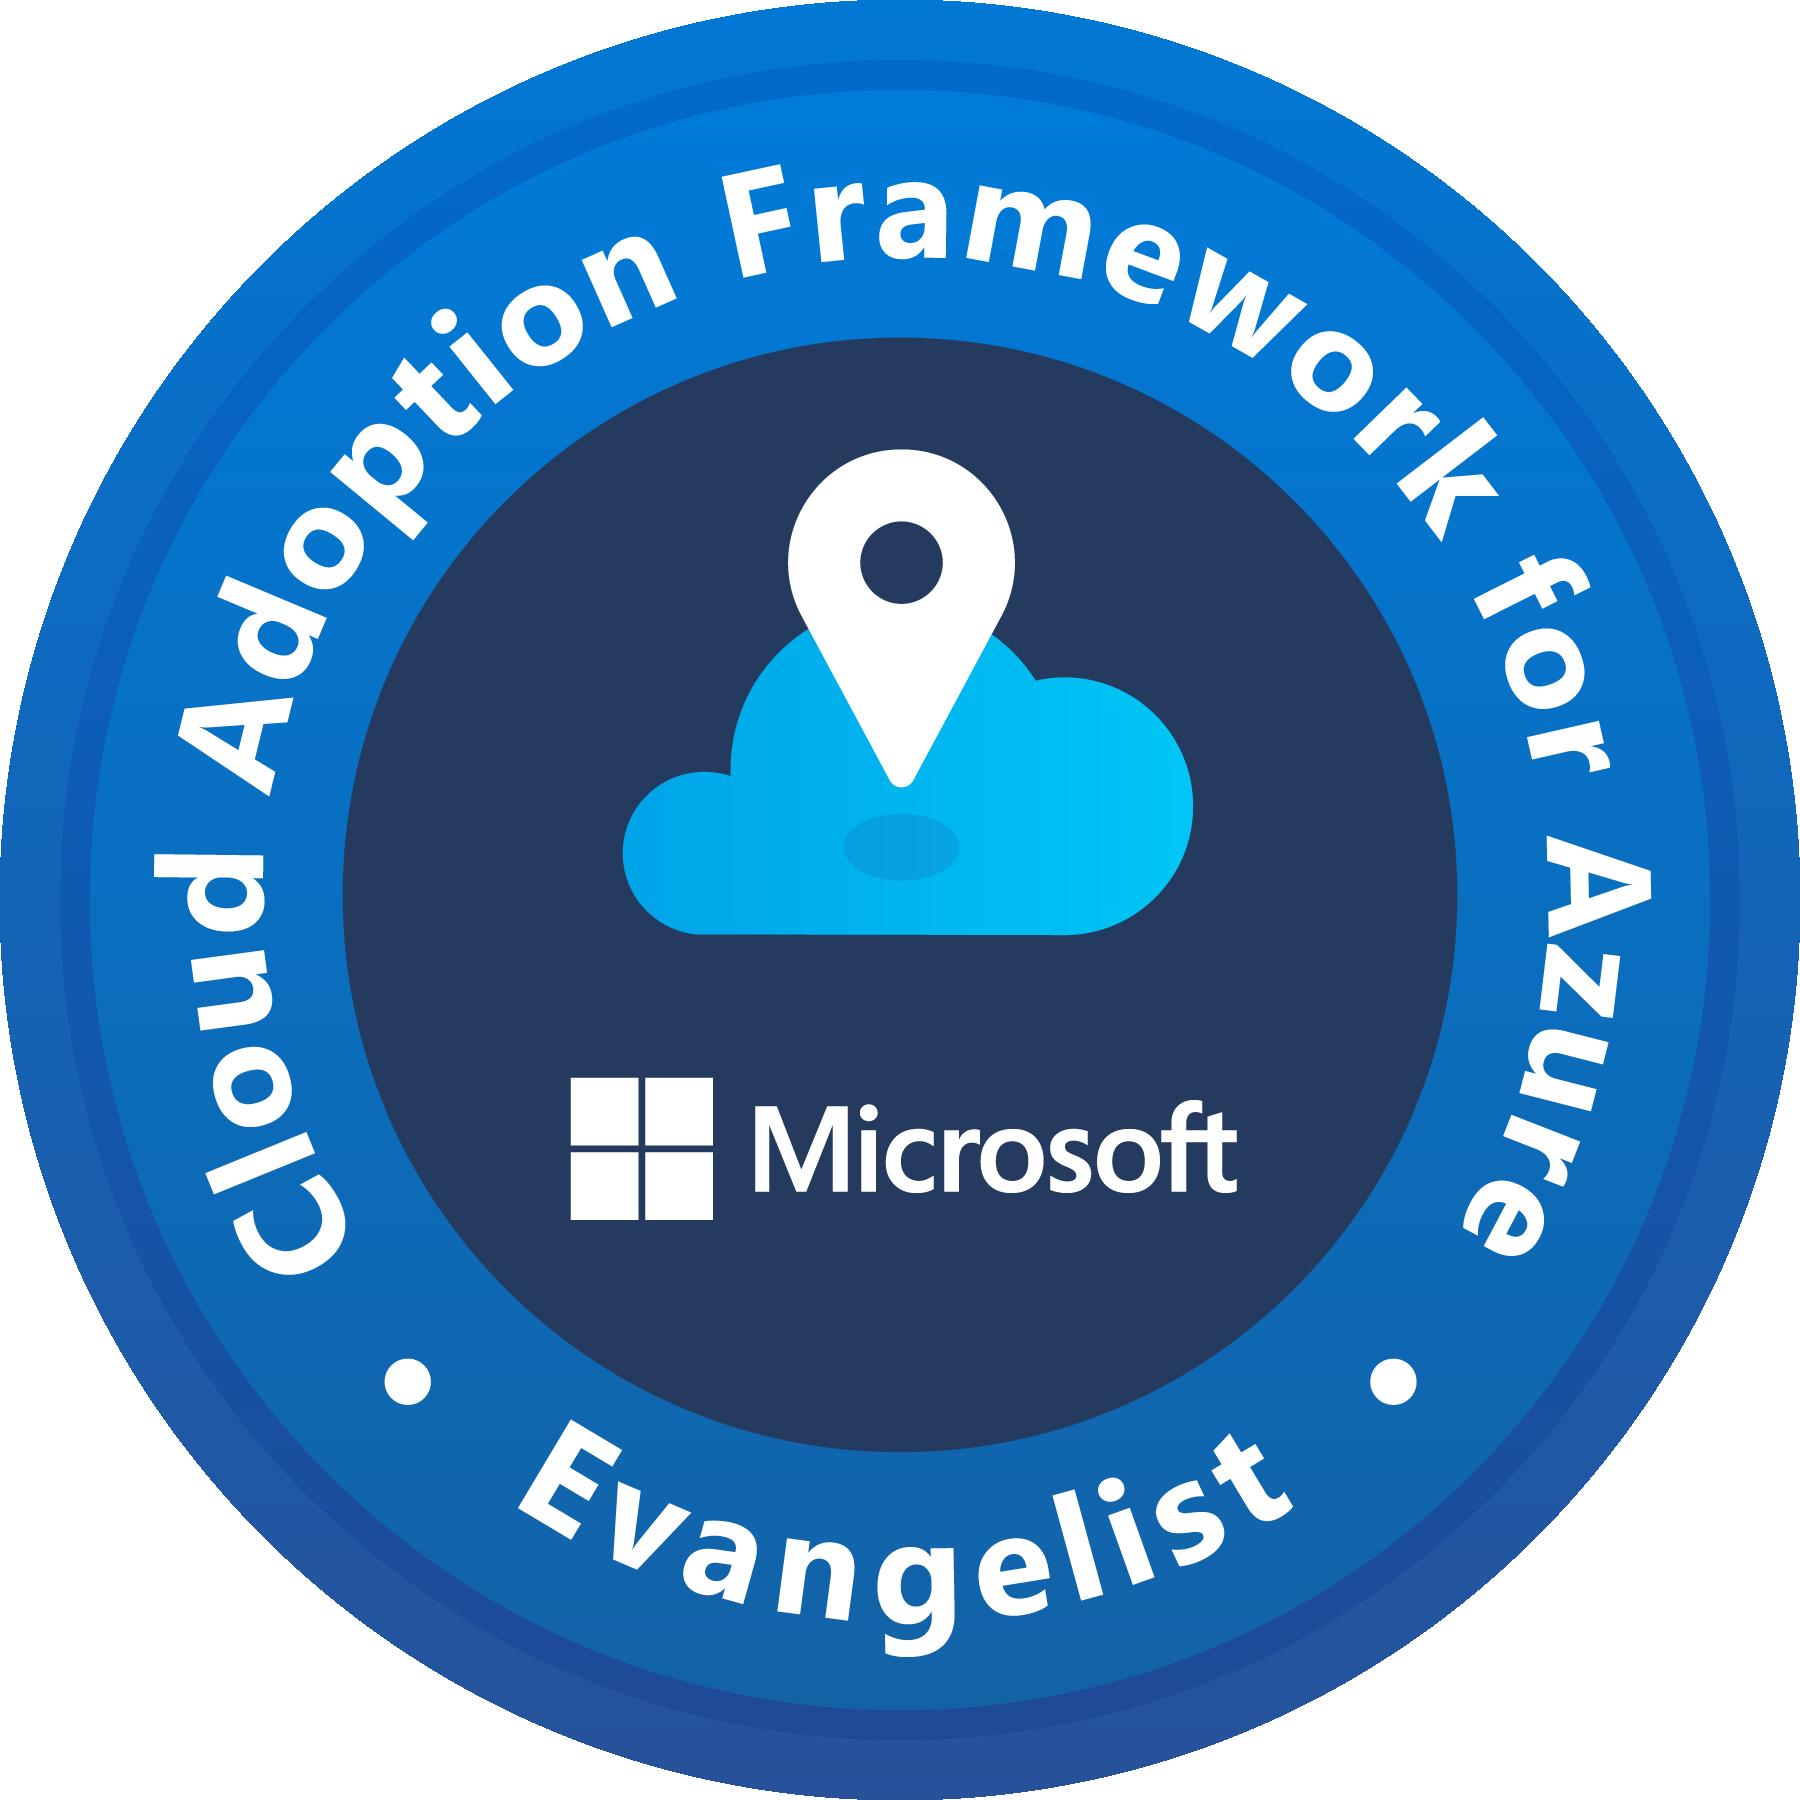 Evangelist - Cloud Adoption Framework for Azure